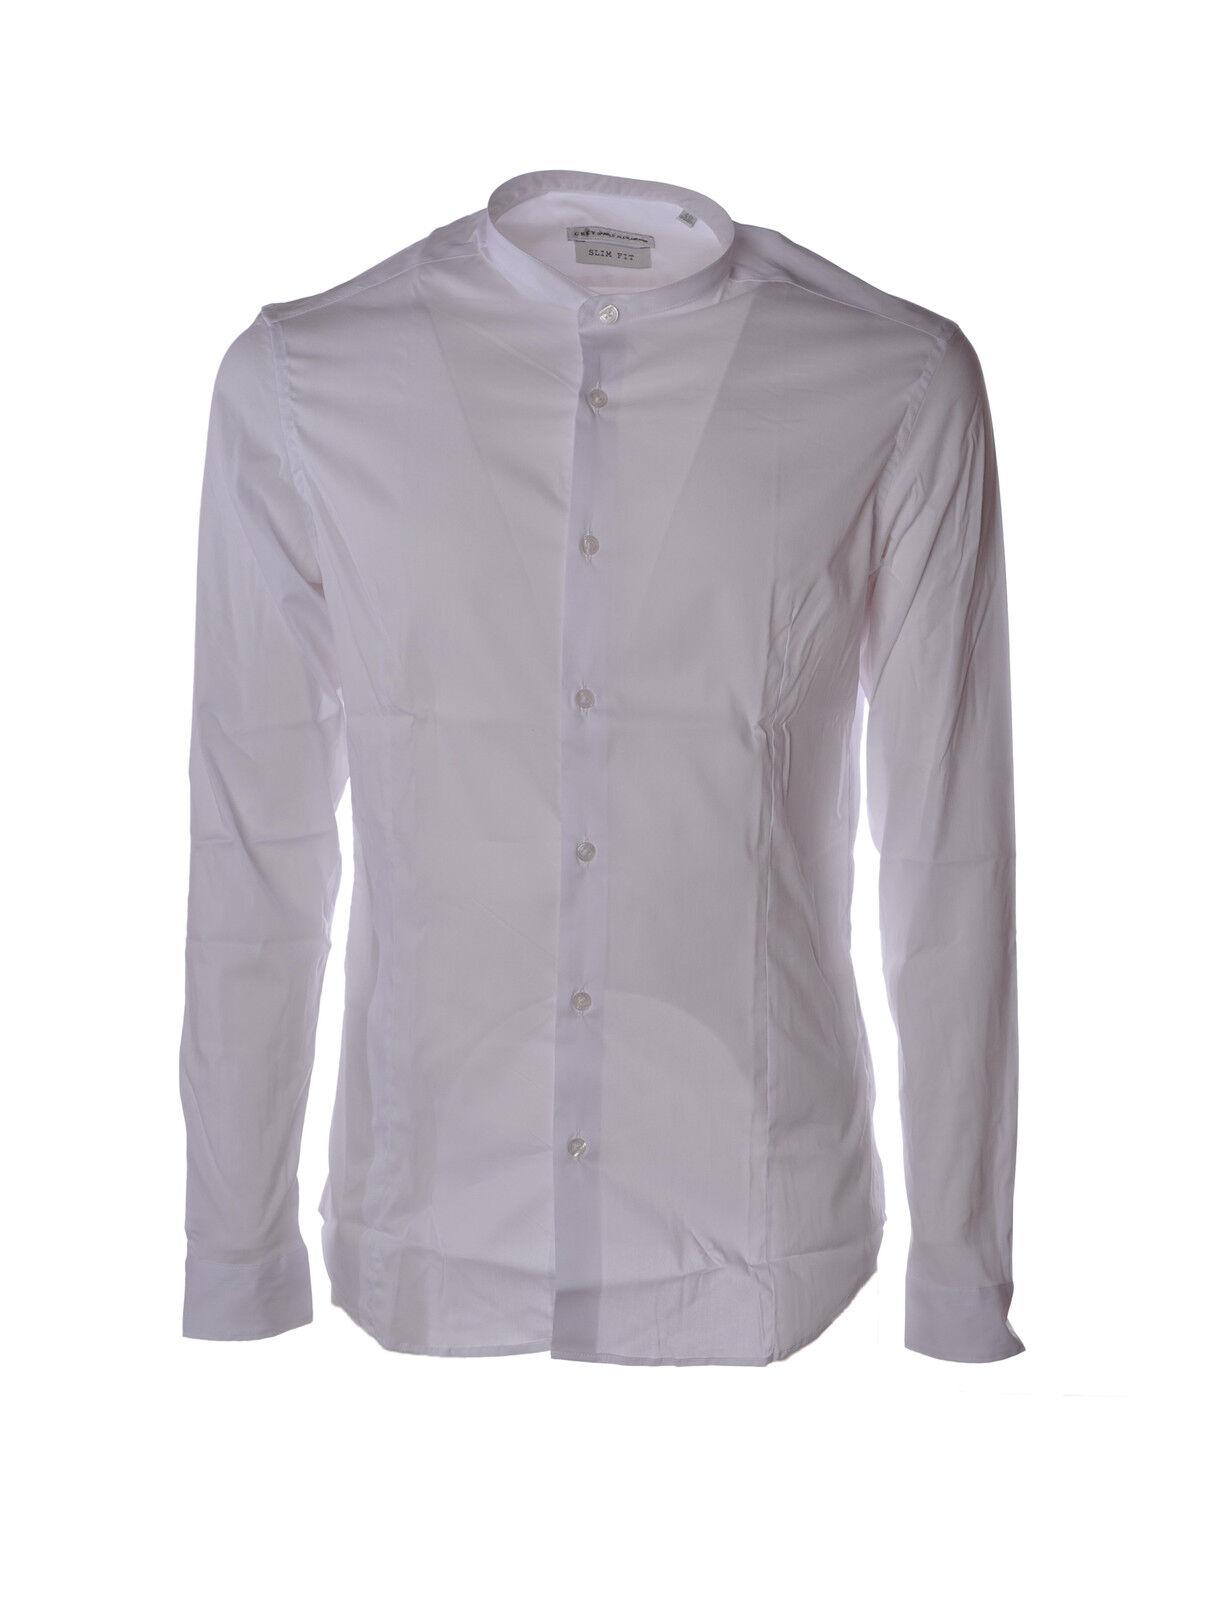 Daniele Alessandrini  -  Shirts - Male - White - 3125013A183446